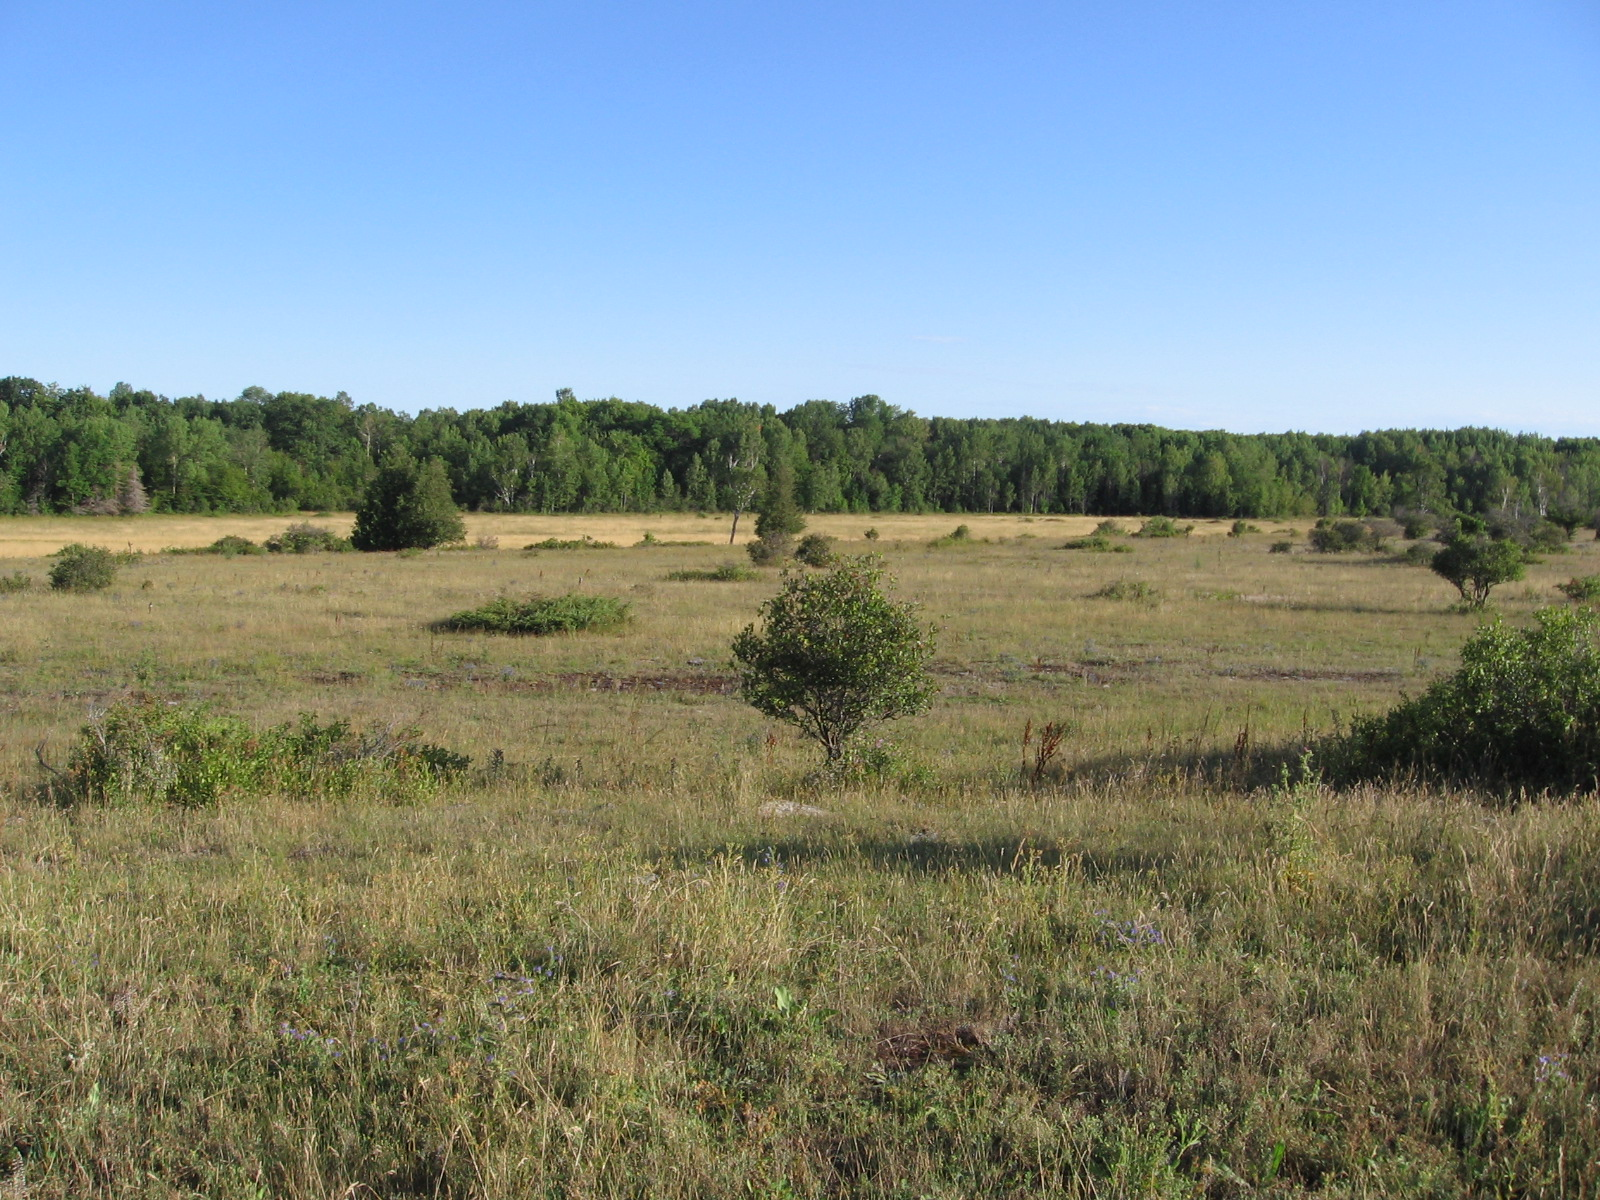 Typical Loggerhead Shrike habitat at the northern edge of the breeding range in Ontario, Canada